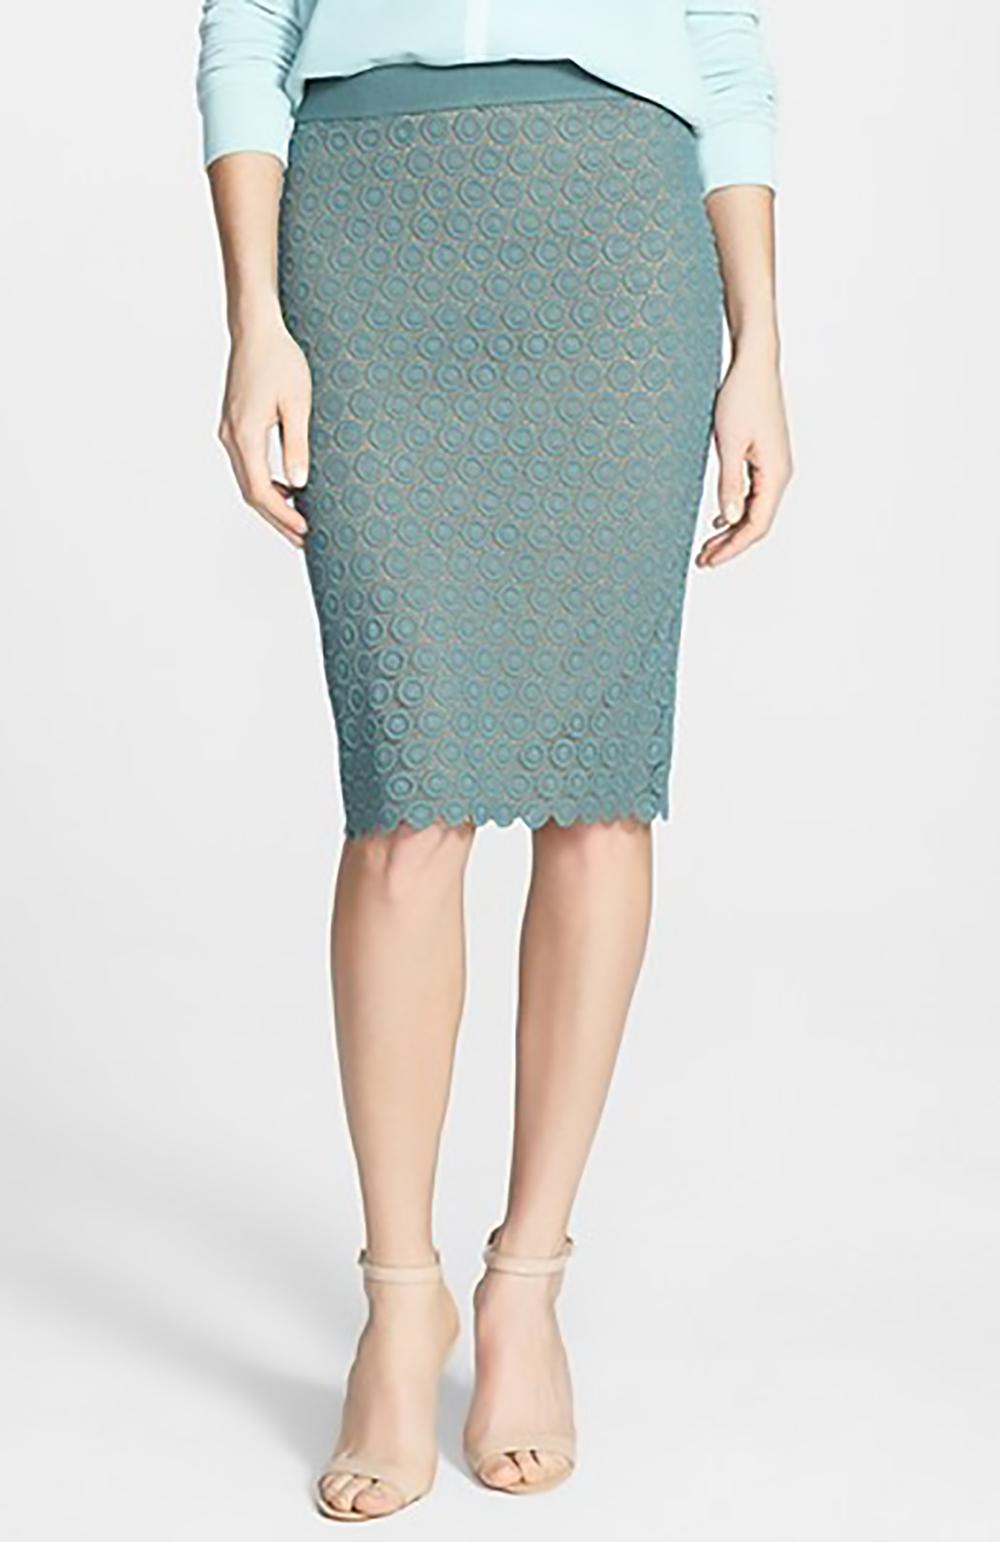 nordstrom bailey 44 simone lace pencil skirt skips 1500.jpg